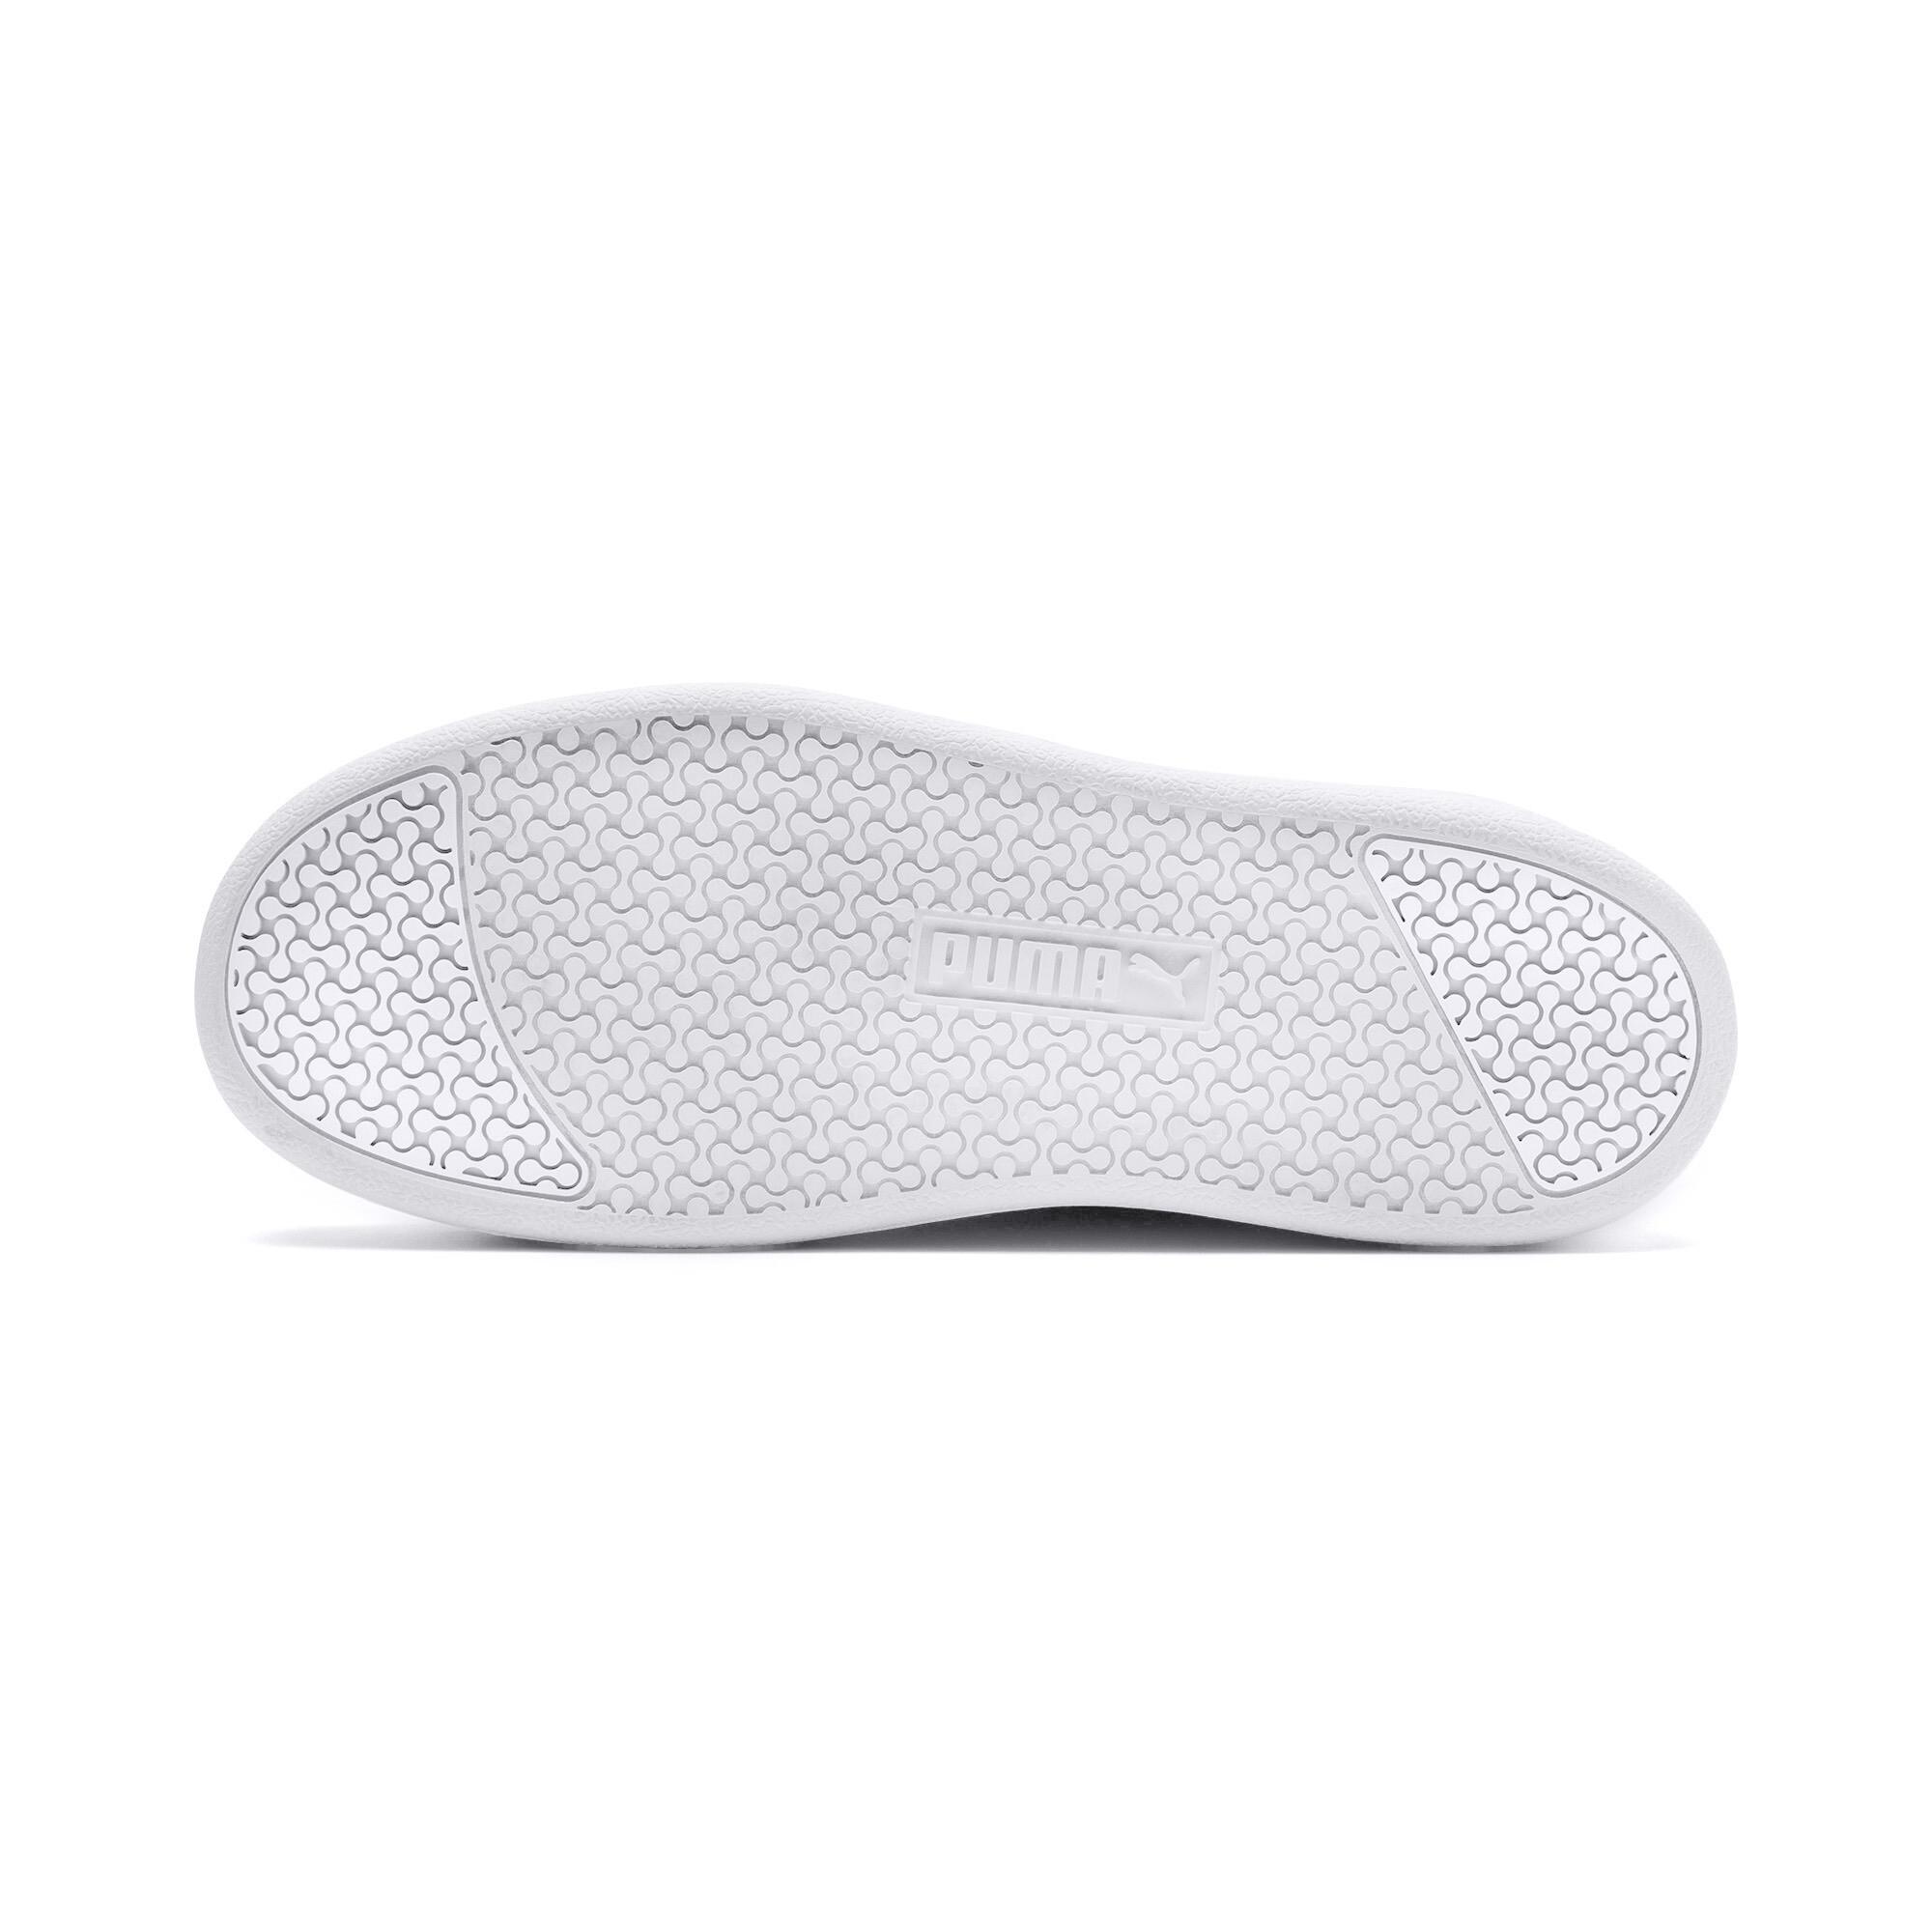 PUMA-Smash-Platform-Leather-Women-039-s-Sneakers-Women-Shoe-Basics thumbnail 5